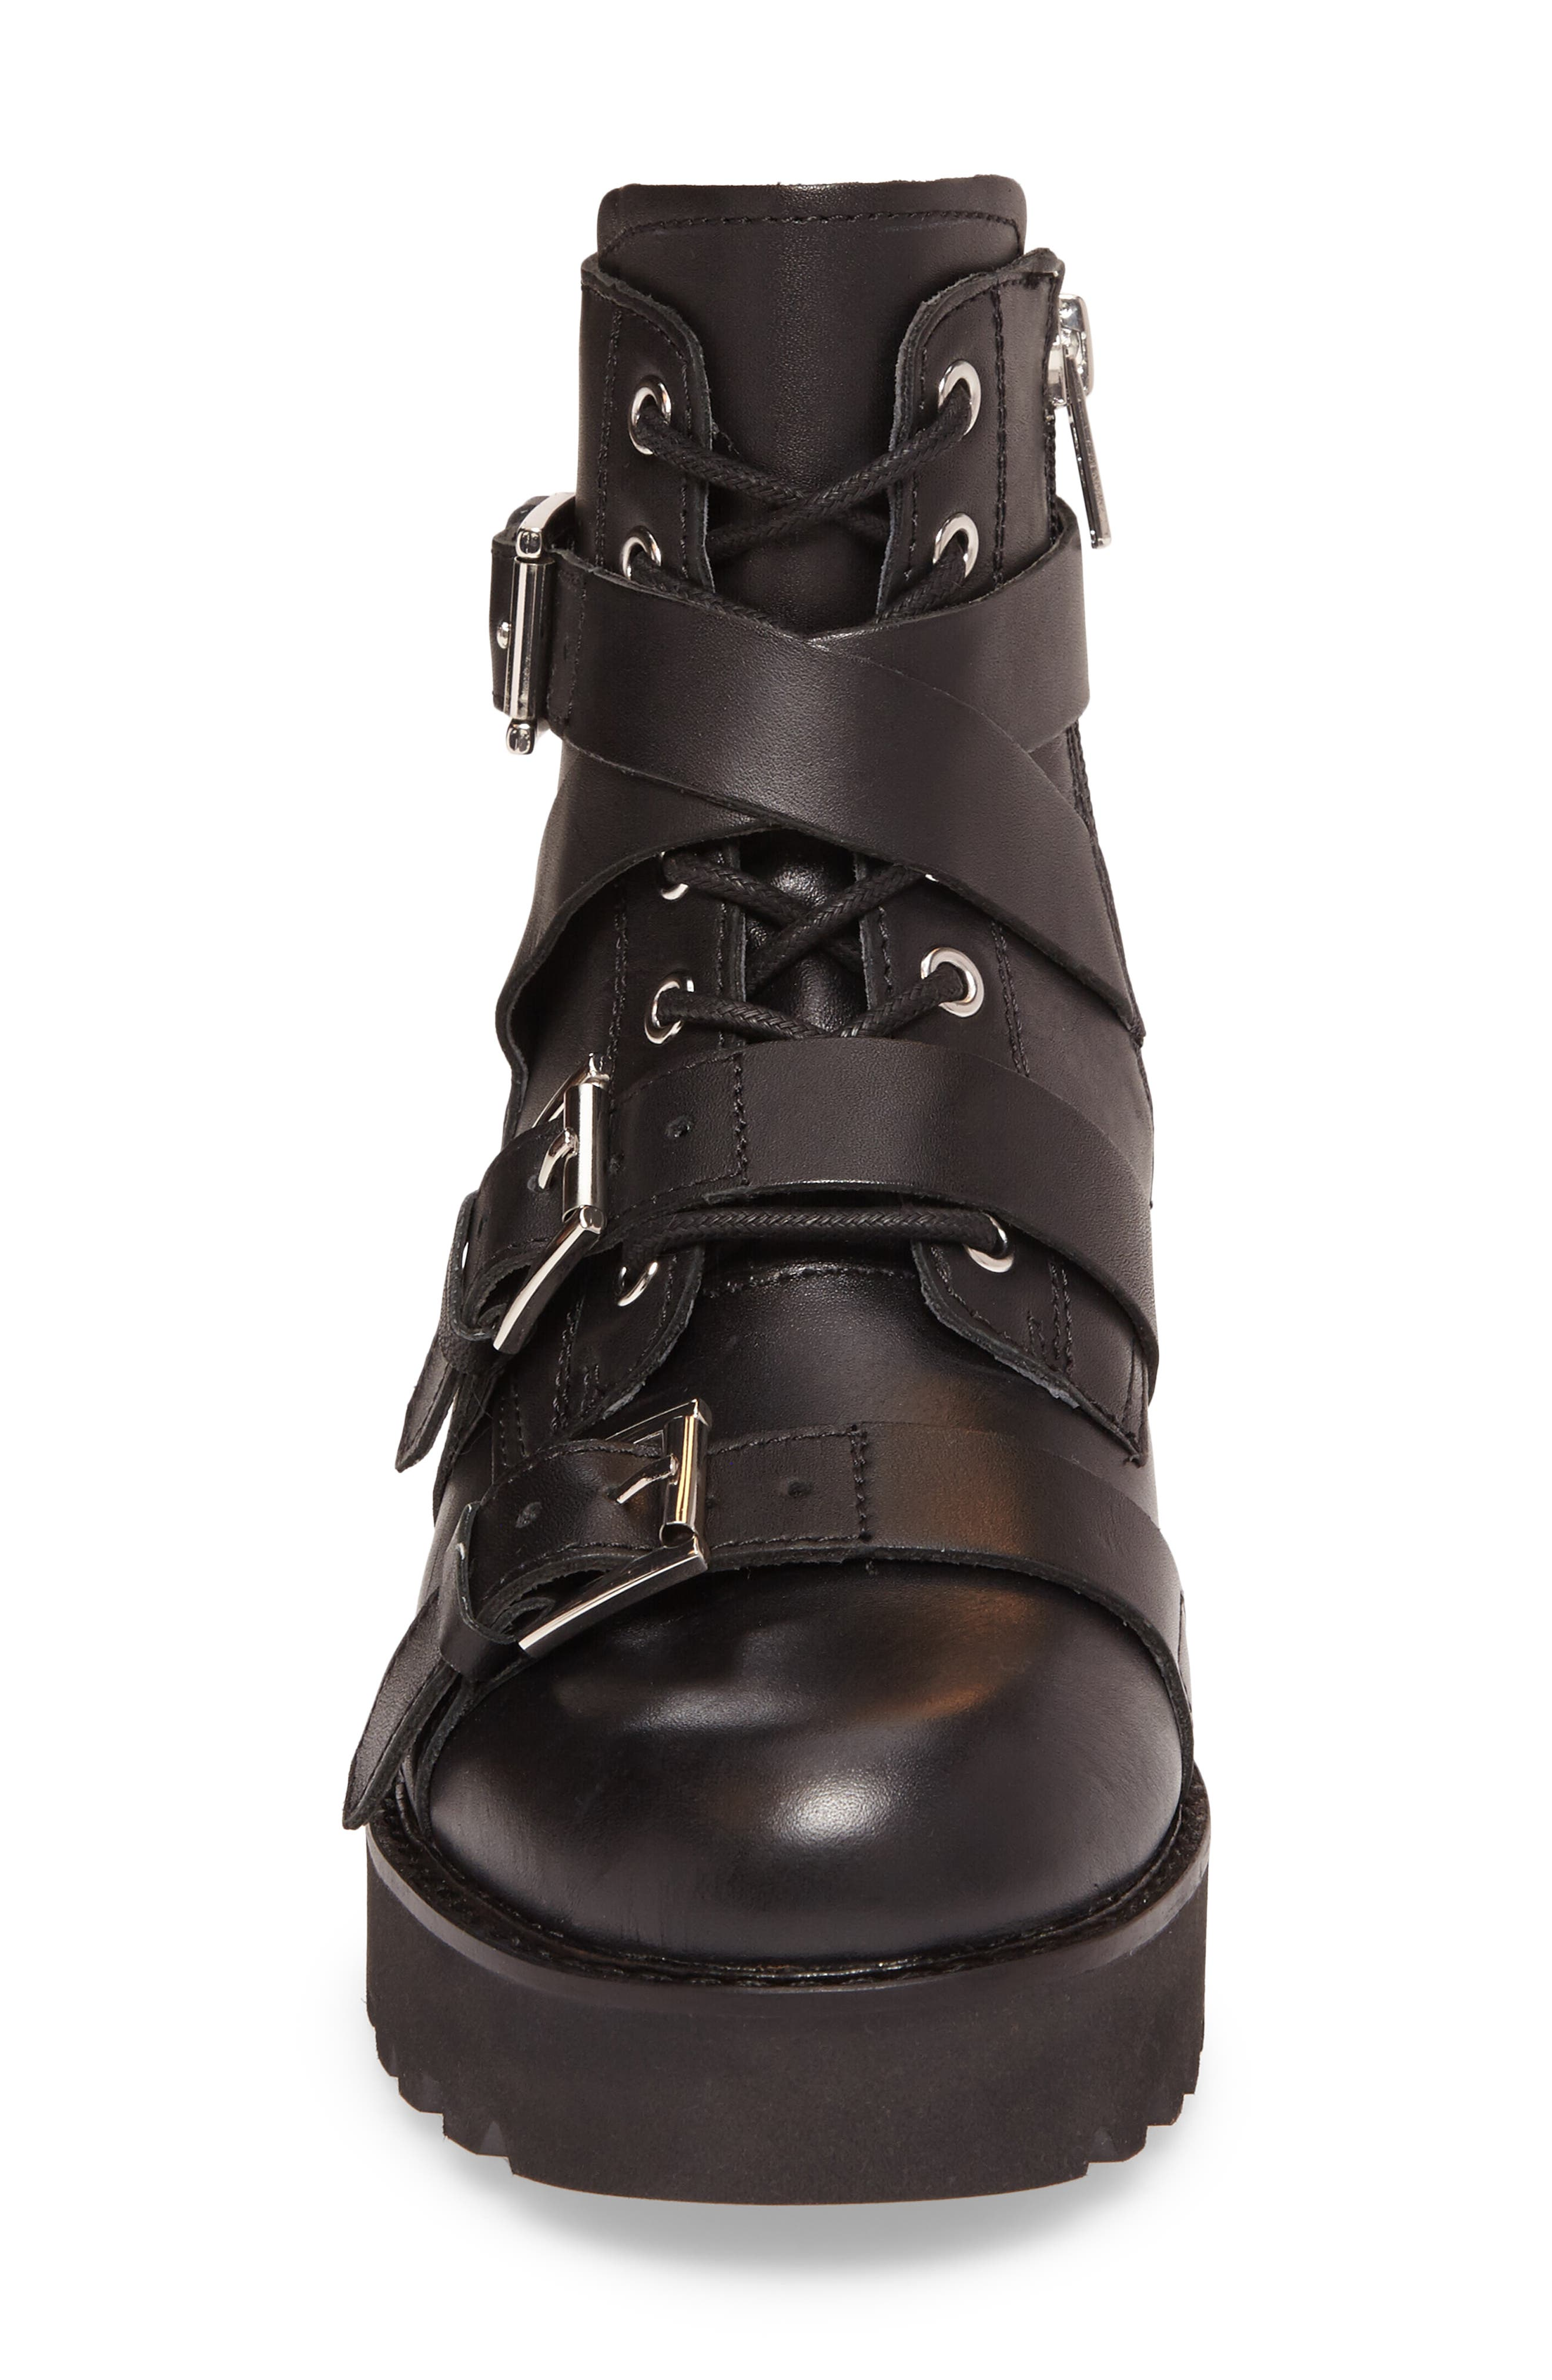 Razor Bootie,                             Alternate thumbnail 4, color,                             Black Leather